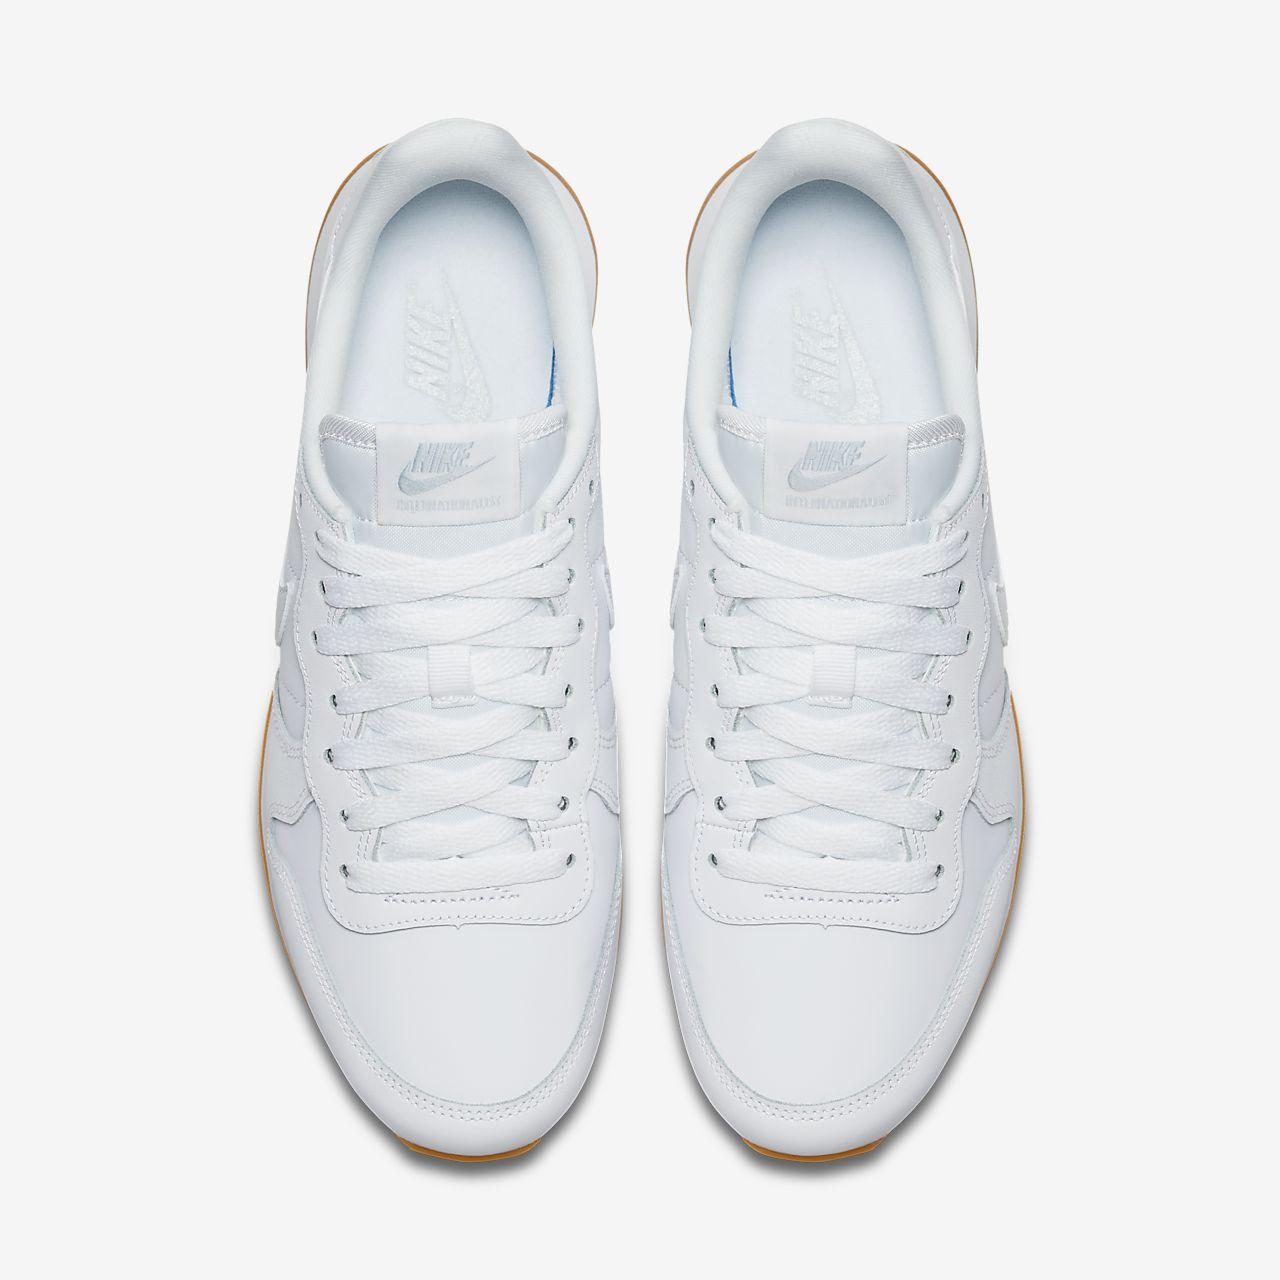 9987532f3 Low Resolution Nike Internationalist Zapatillas - Mujer Nike  Internationalist Zapatillas - Mujer